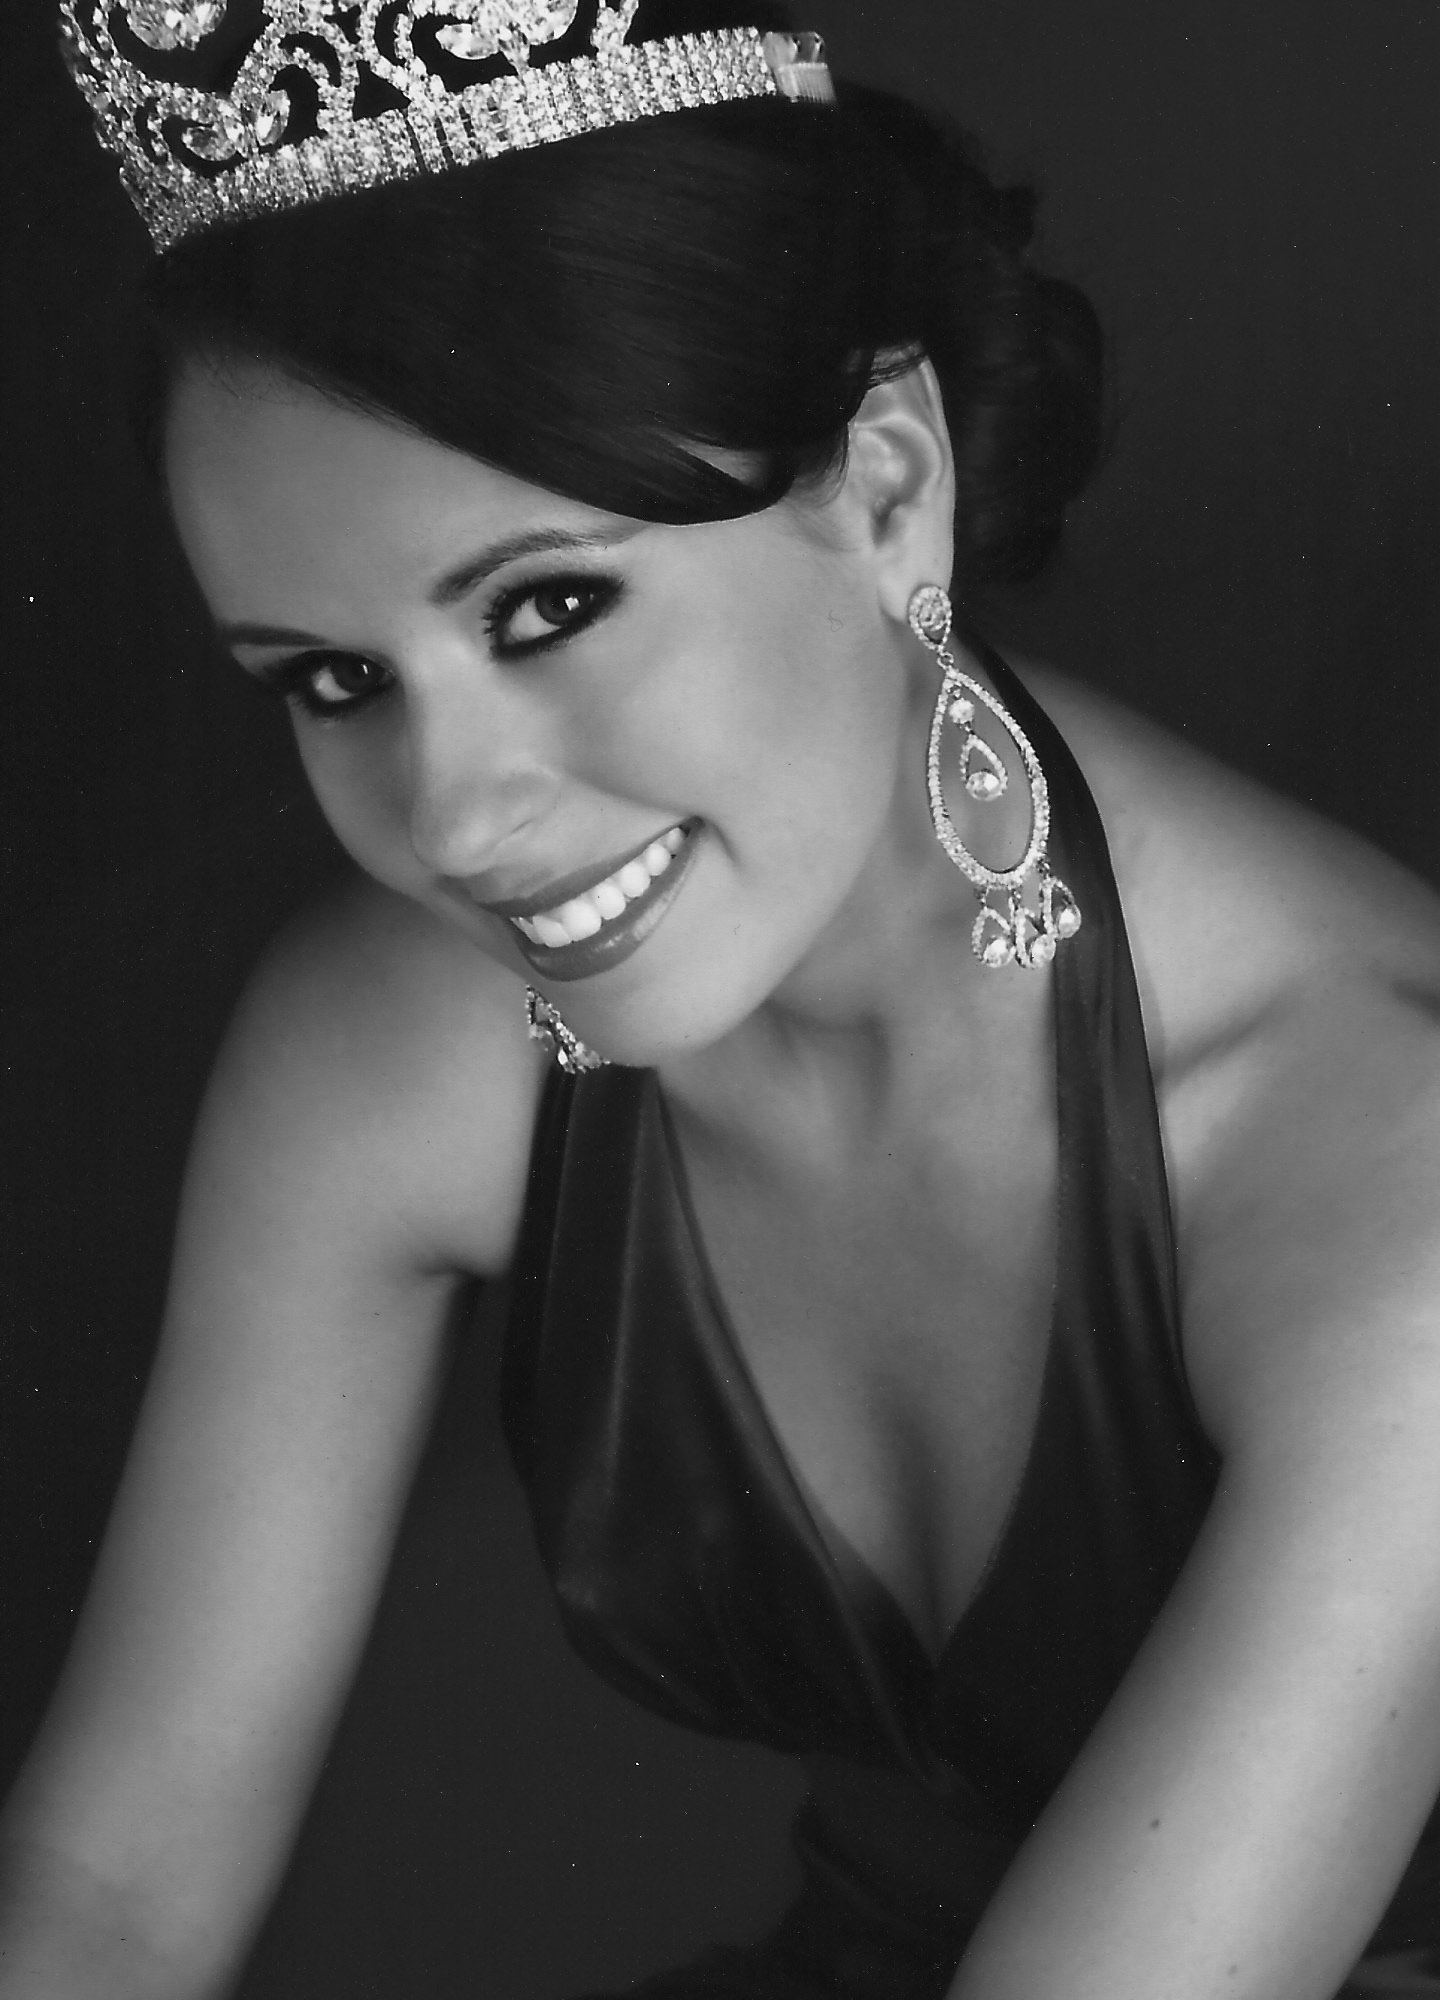 Mrs. Colorado America 2007